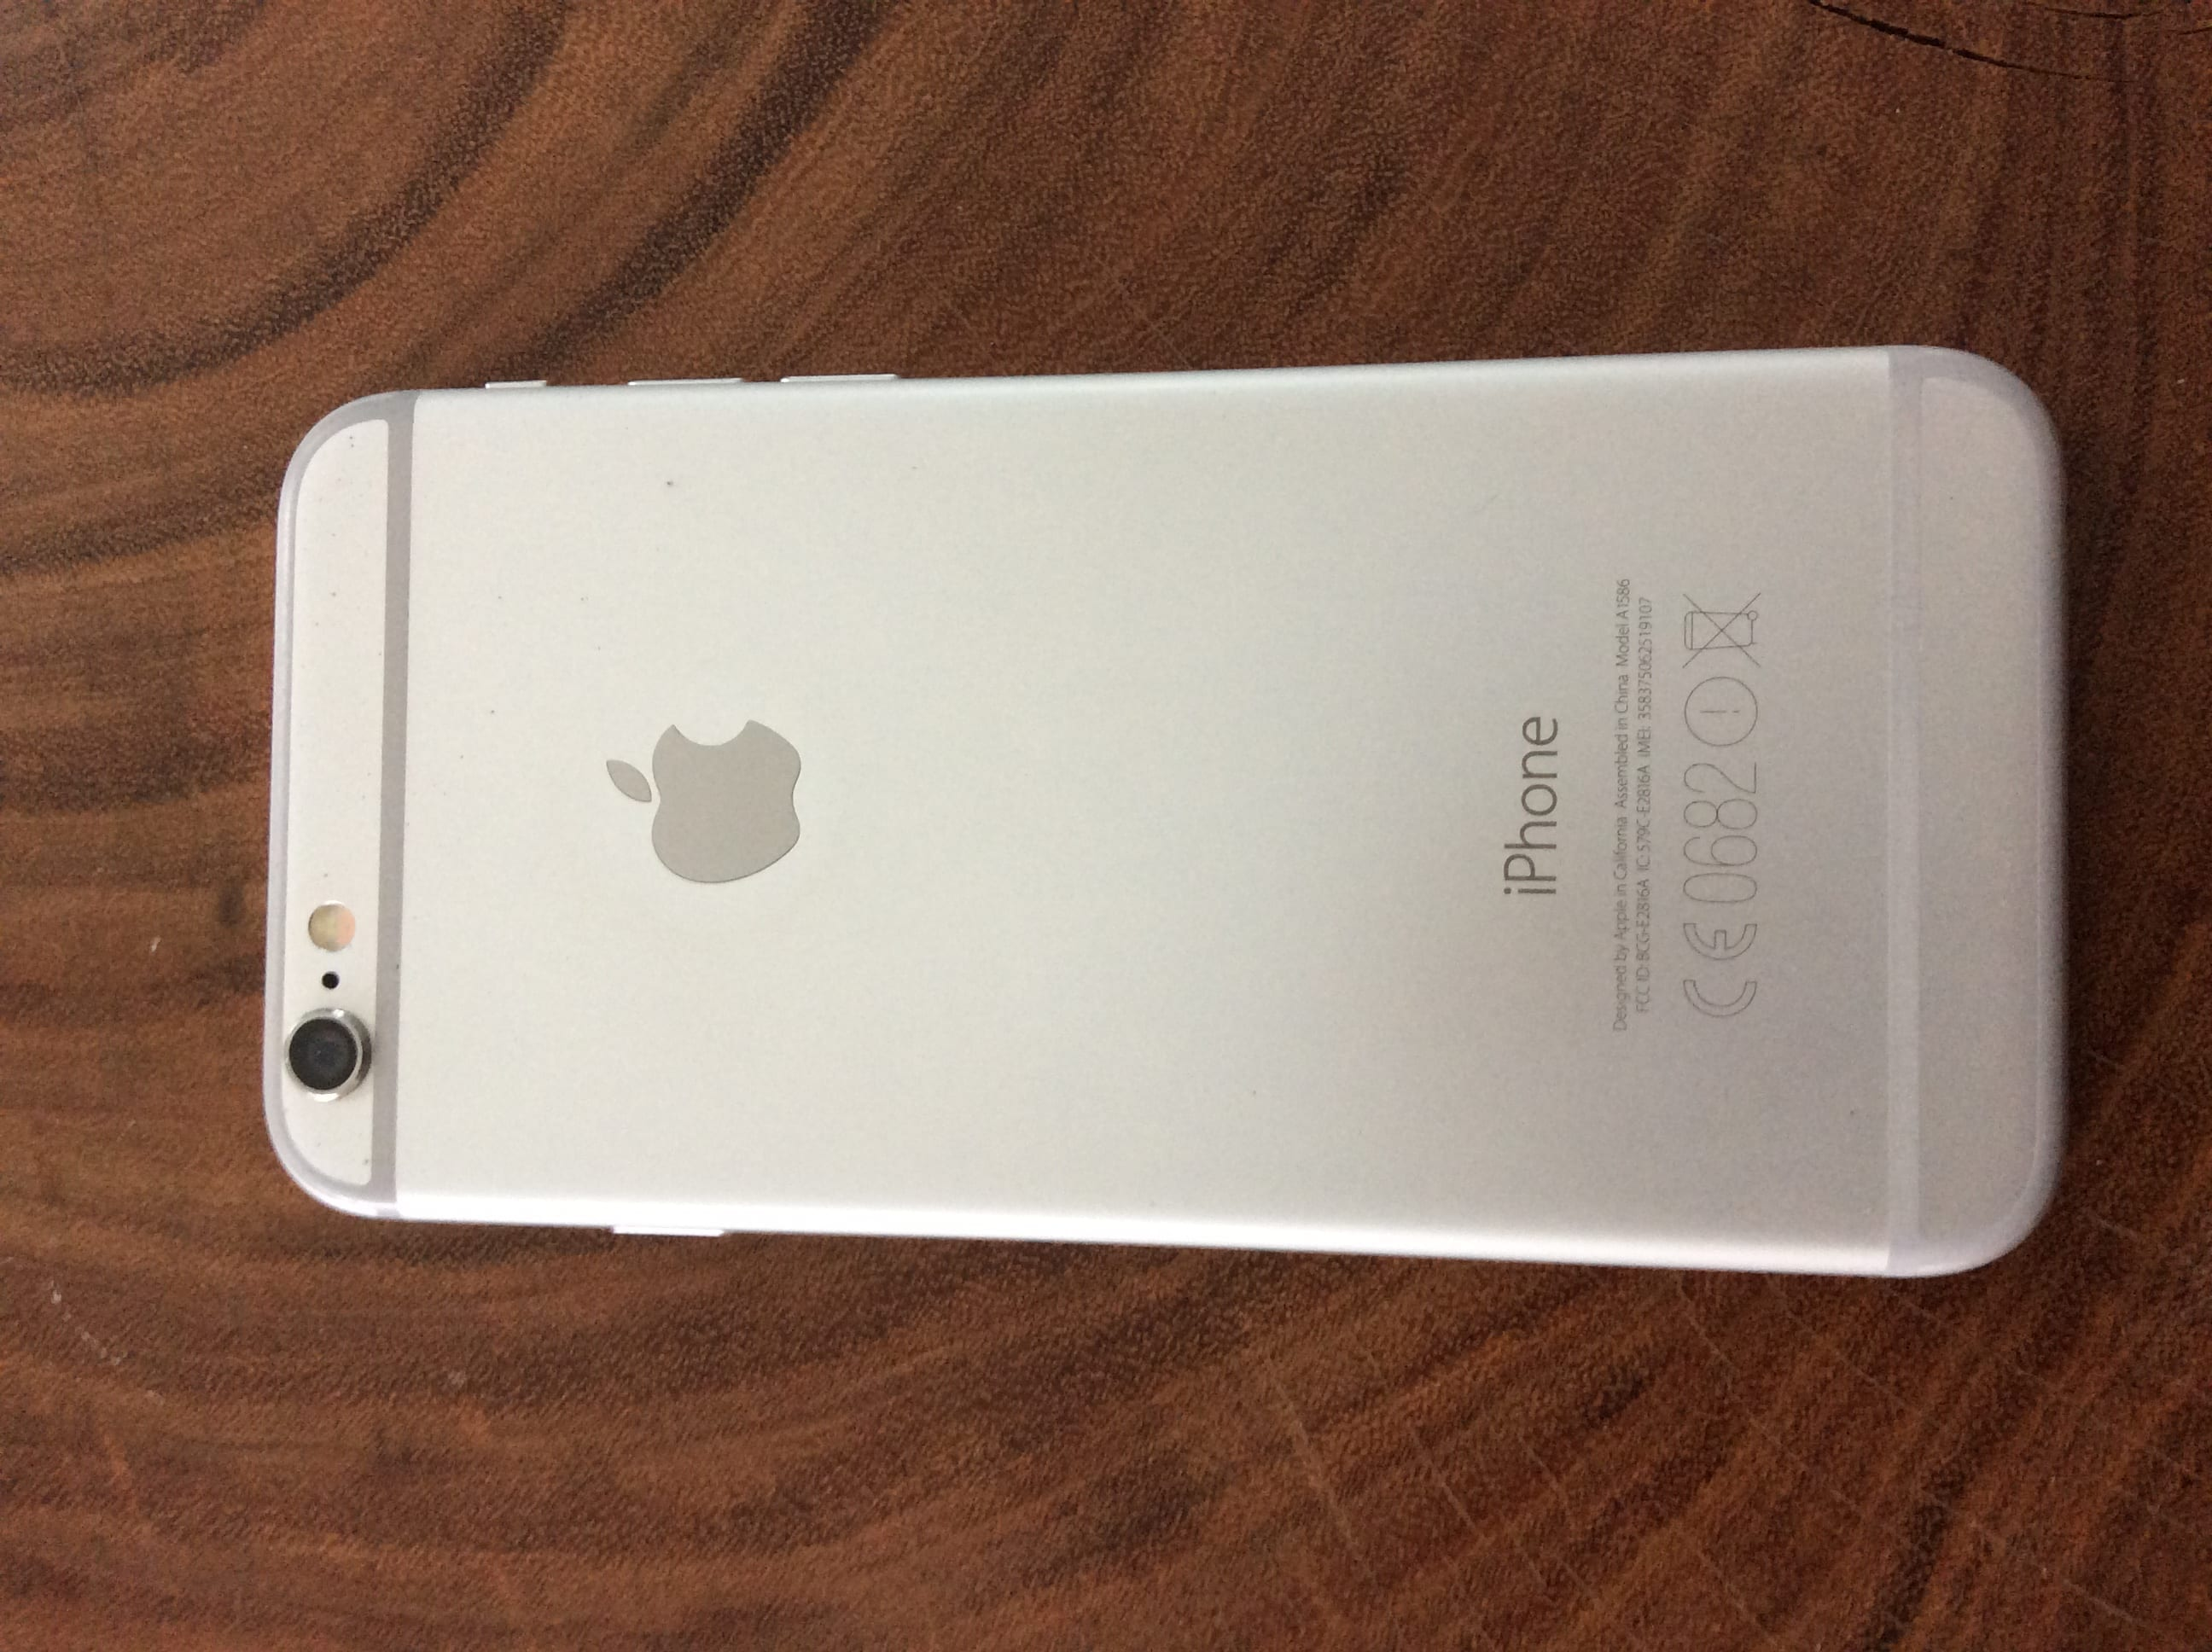 Zobraziť inzerát ~ MacBlog.sk - iPhone - Predam Apple iPhone 6 7225036d98e